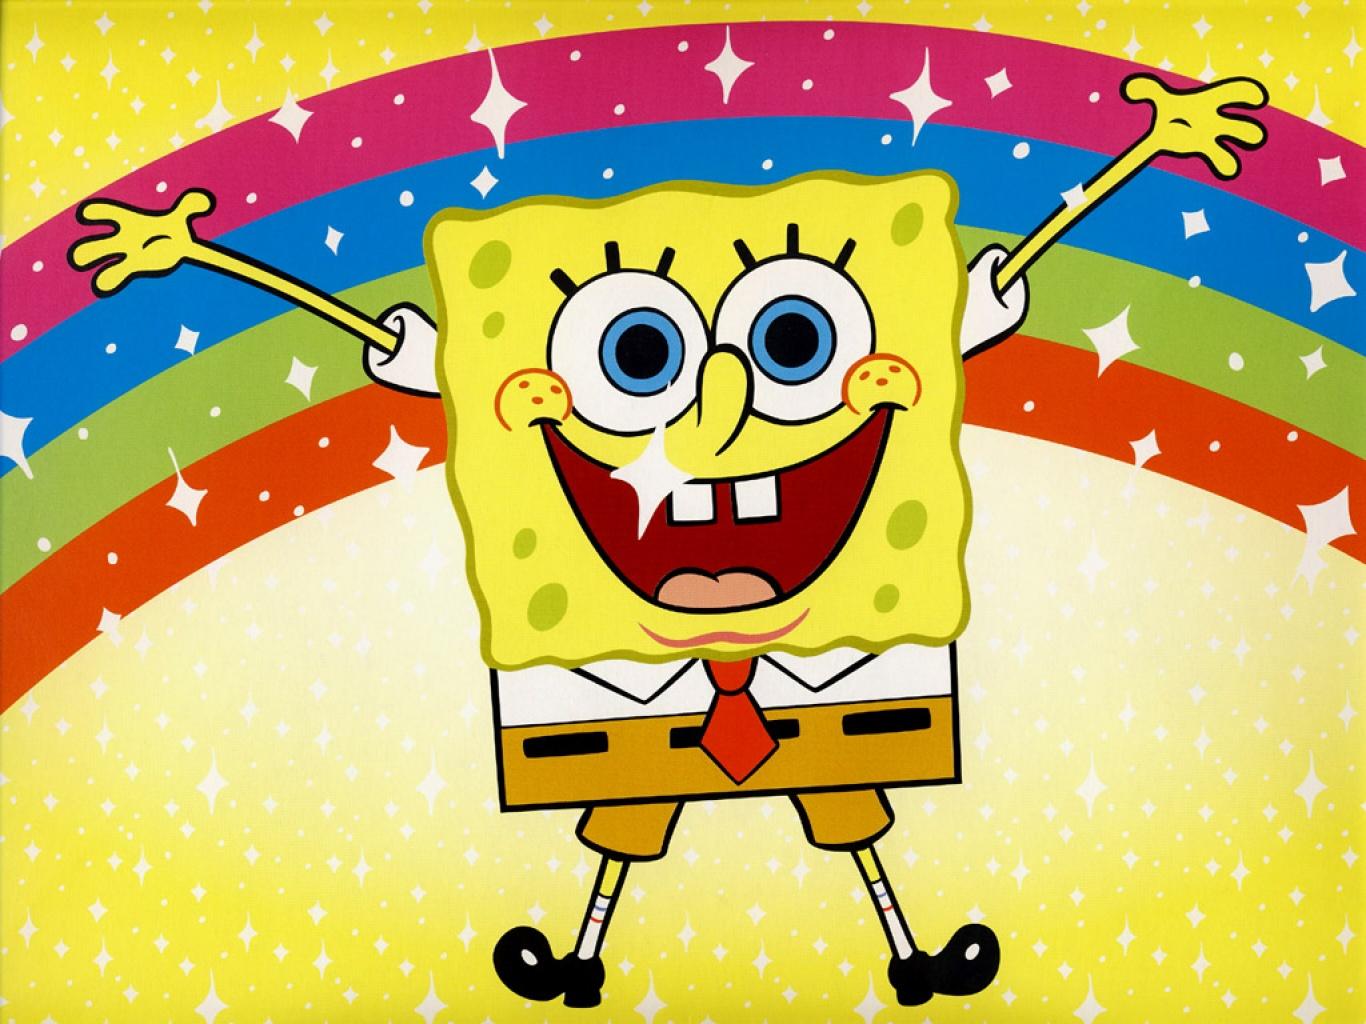 Spongebob Wallpaper HD Background 1366x1024